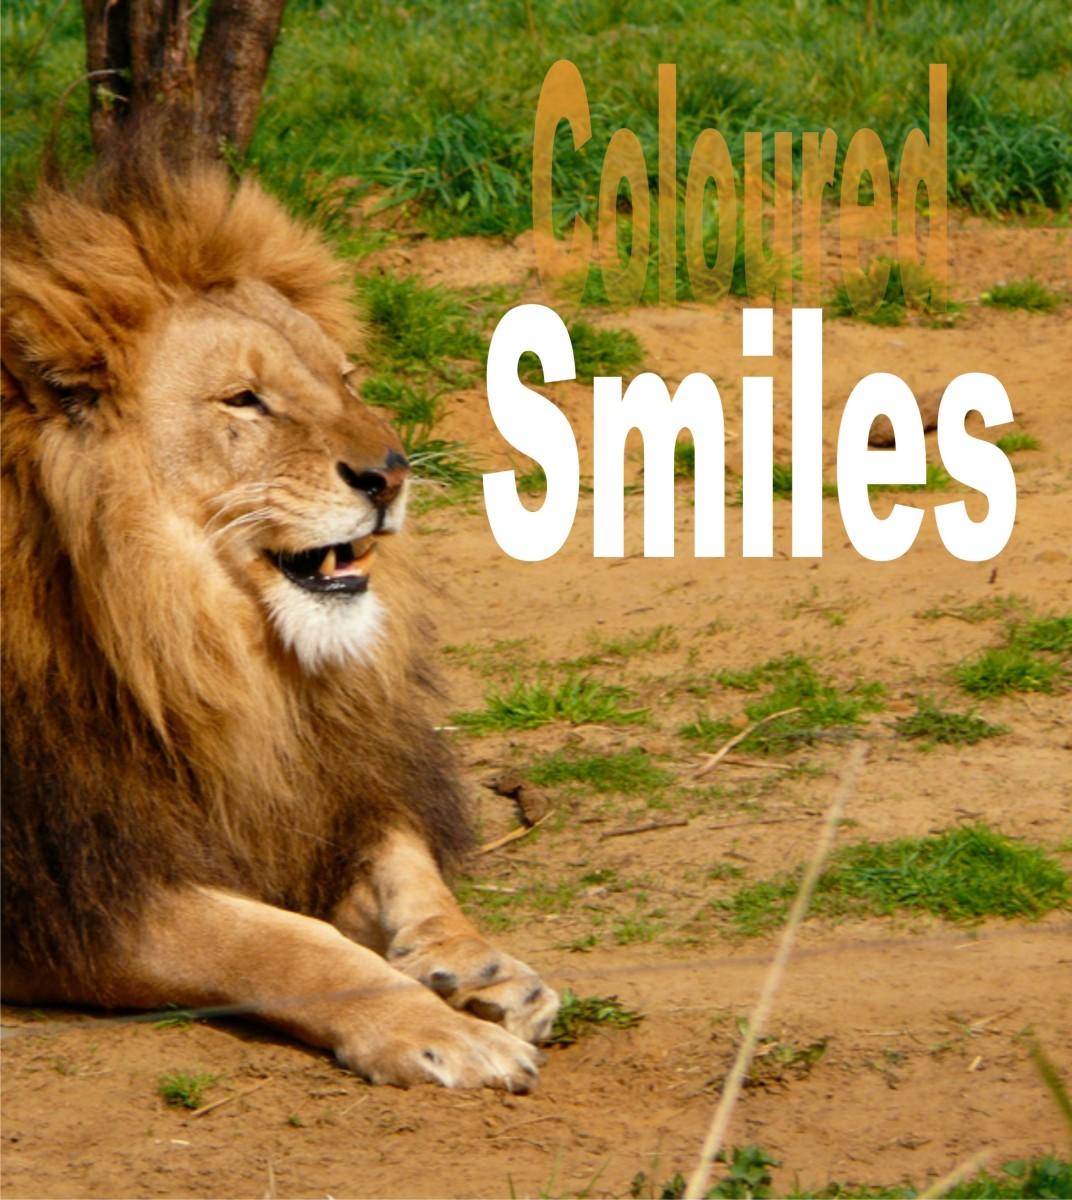 Coloured Smiles: The Deceitful Friend